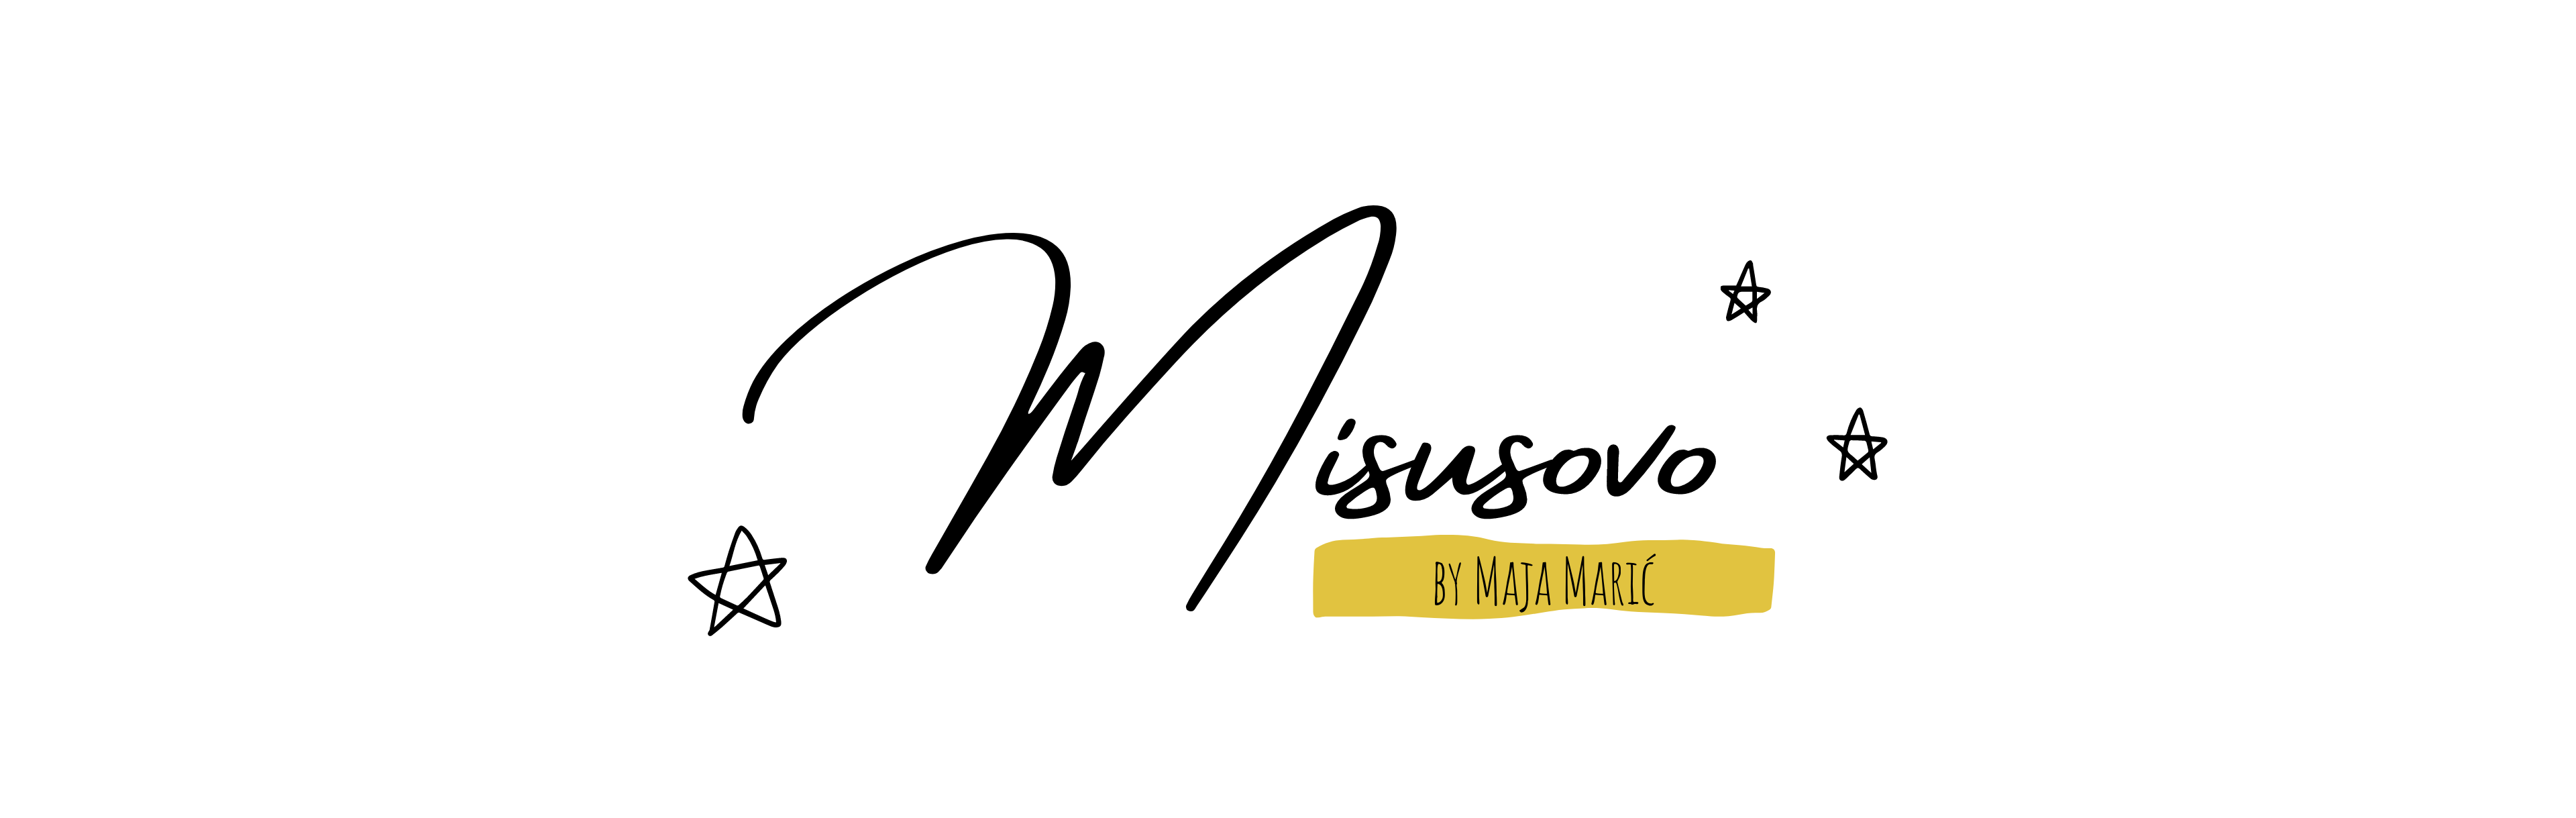 #misusovo